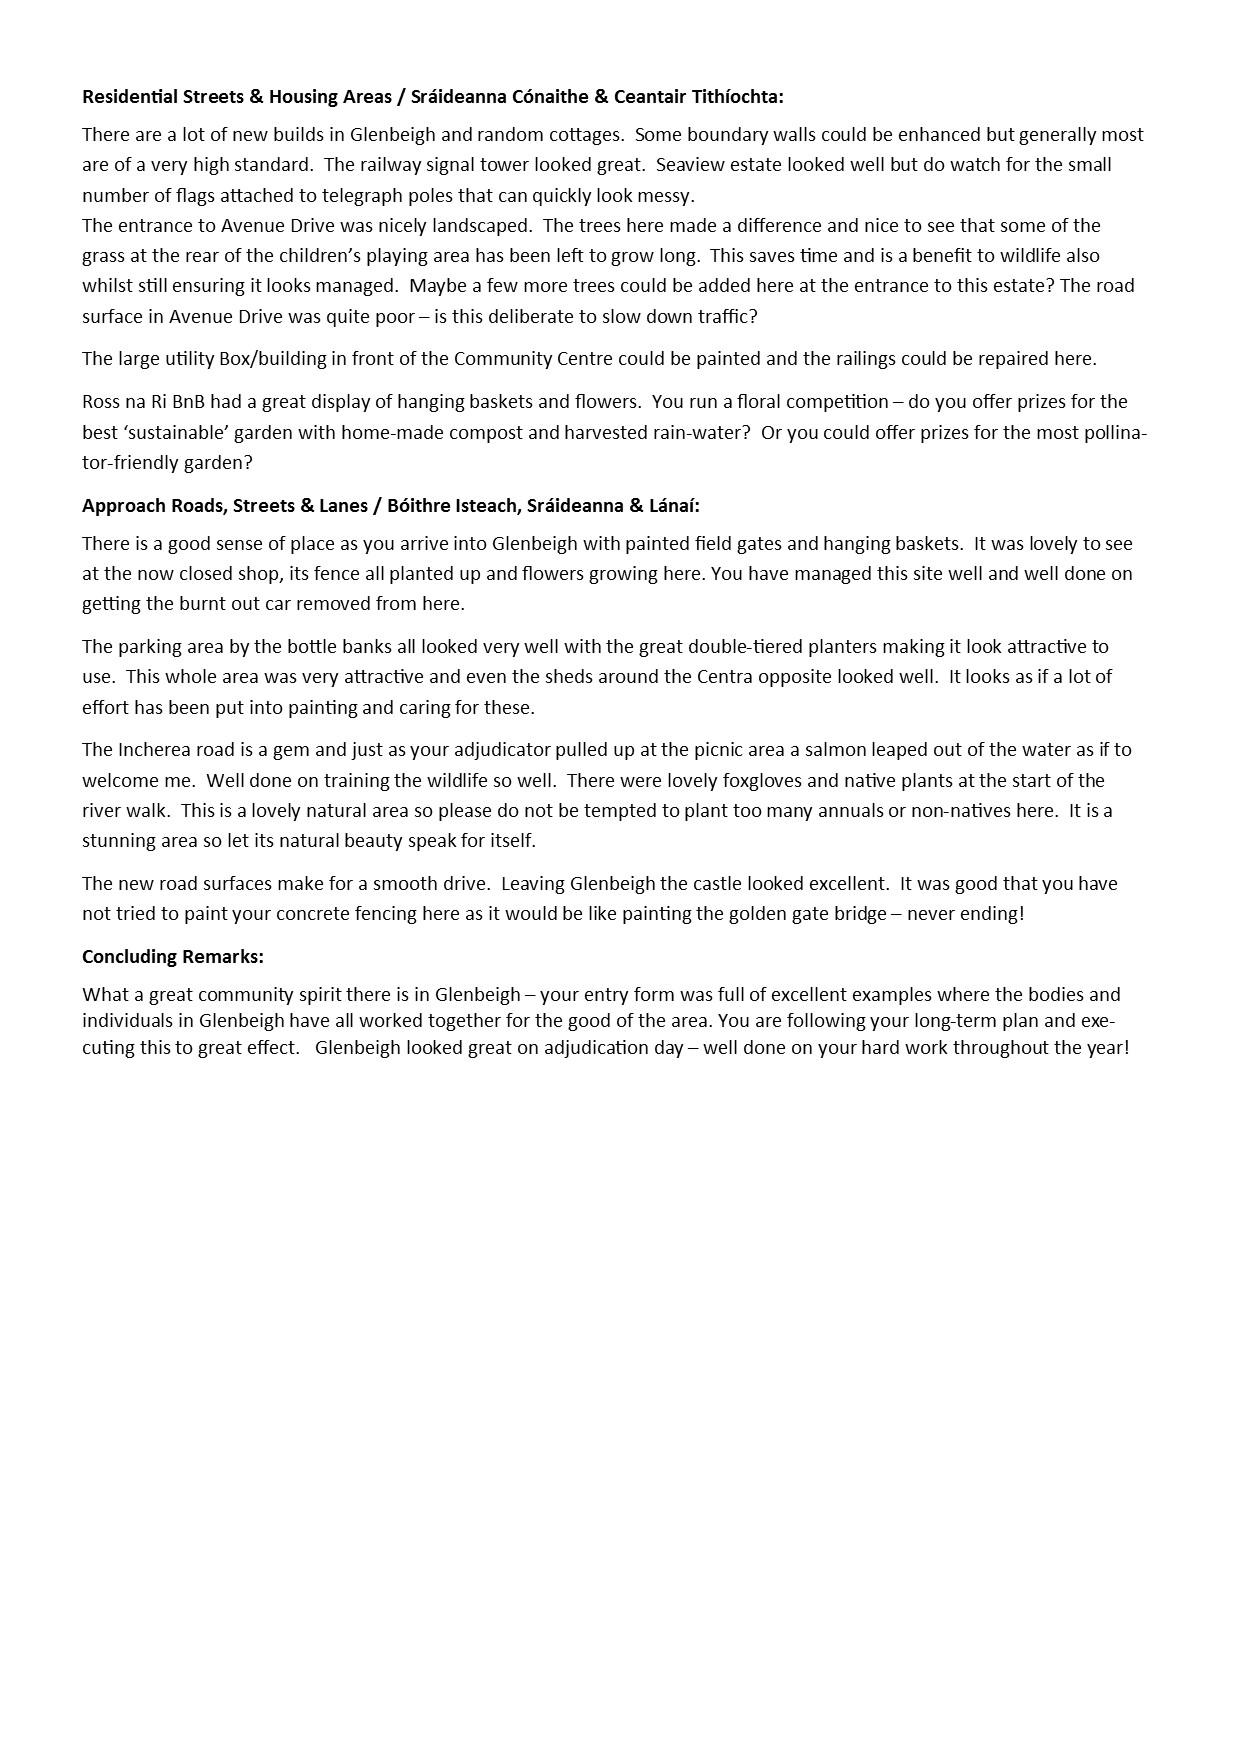 Adjudication Report page 3